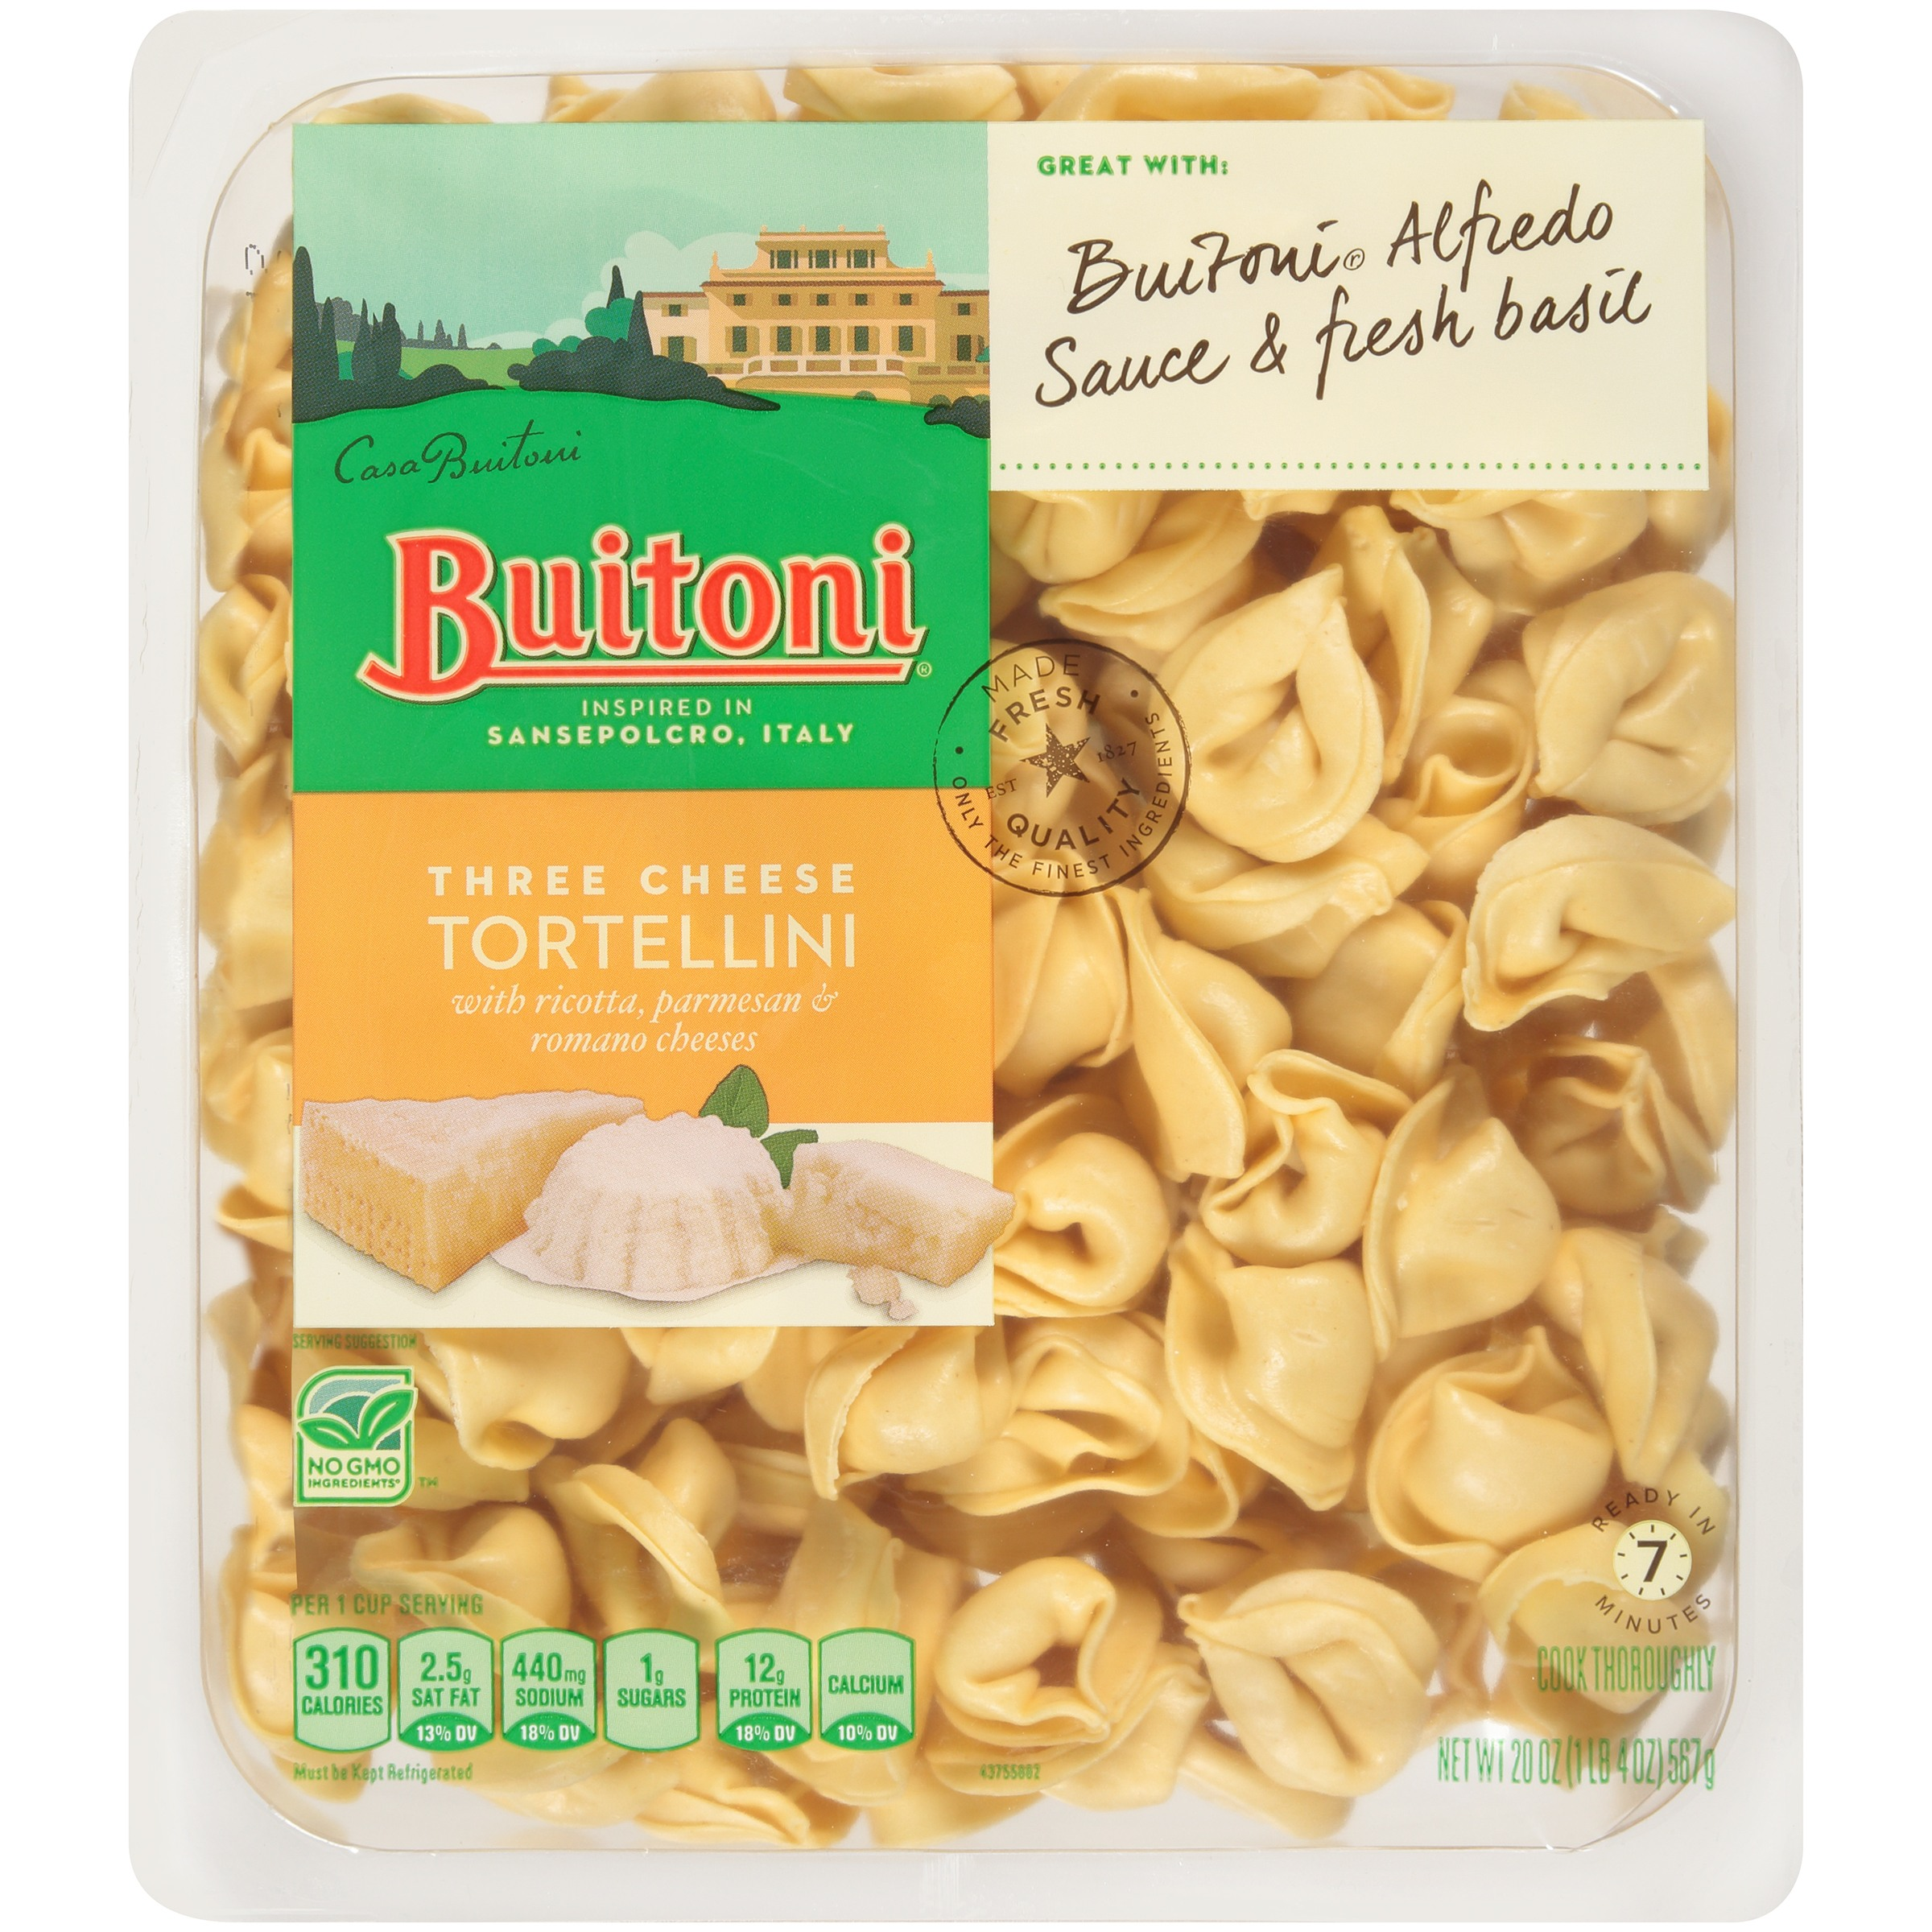 BUITONI Refrigerated Three Cheese Tortellini 20 oz. Tray